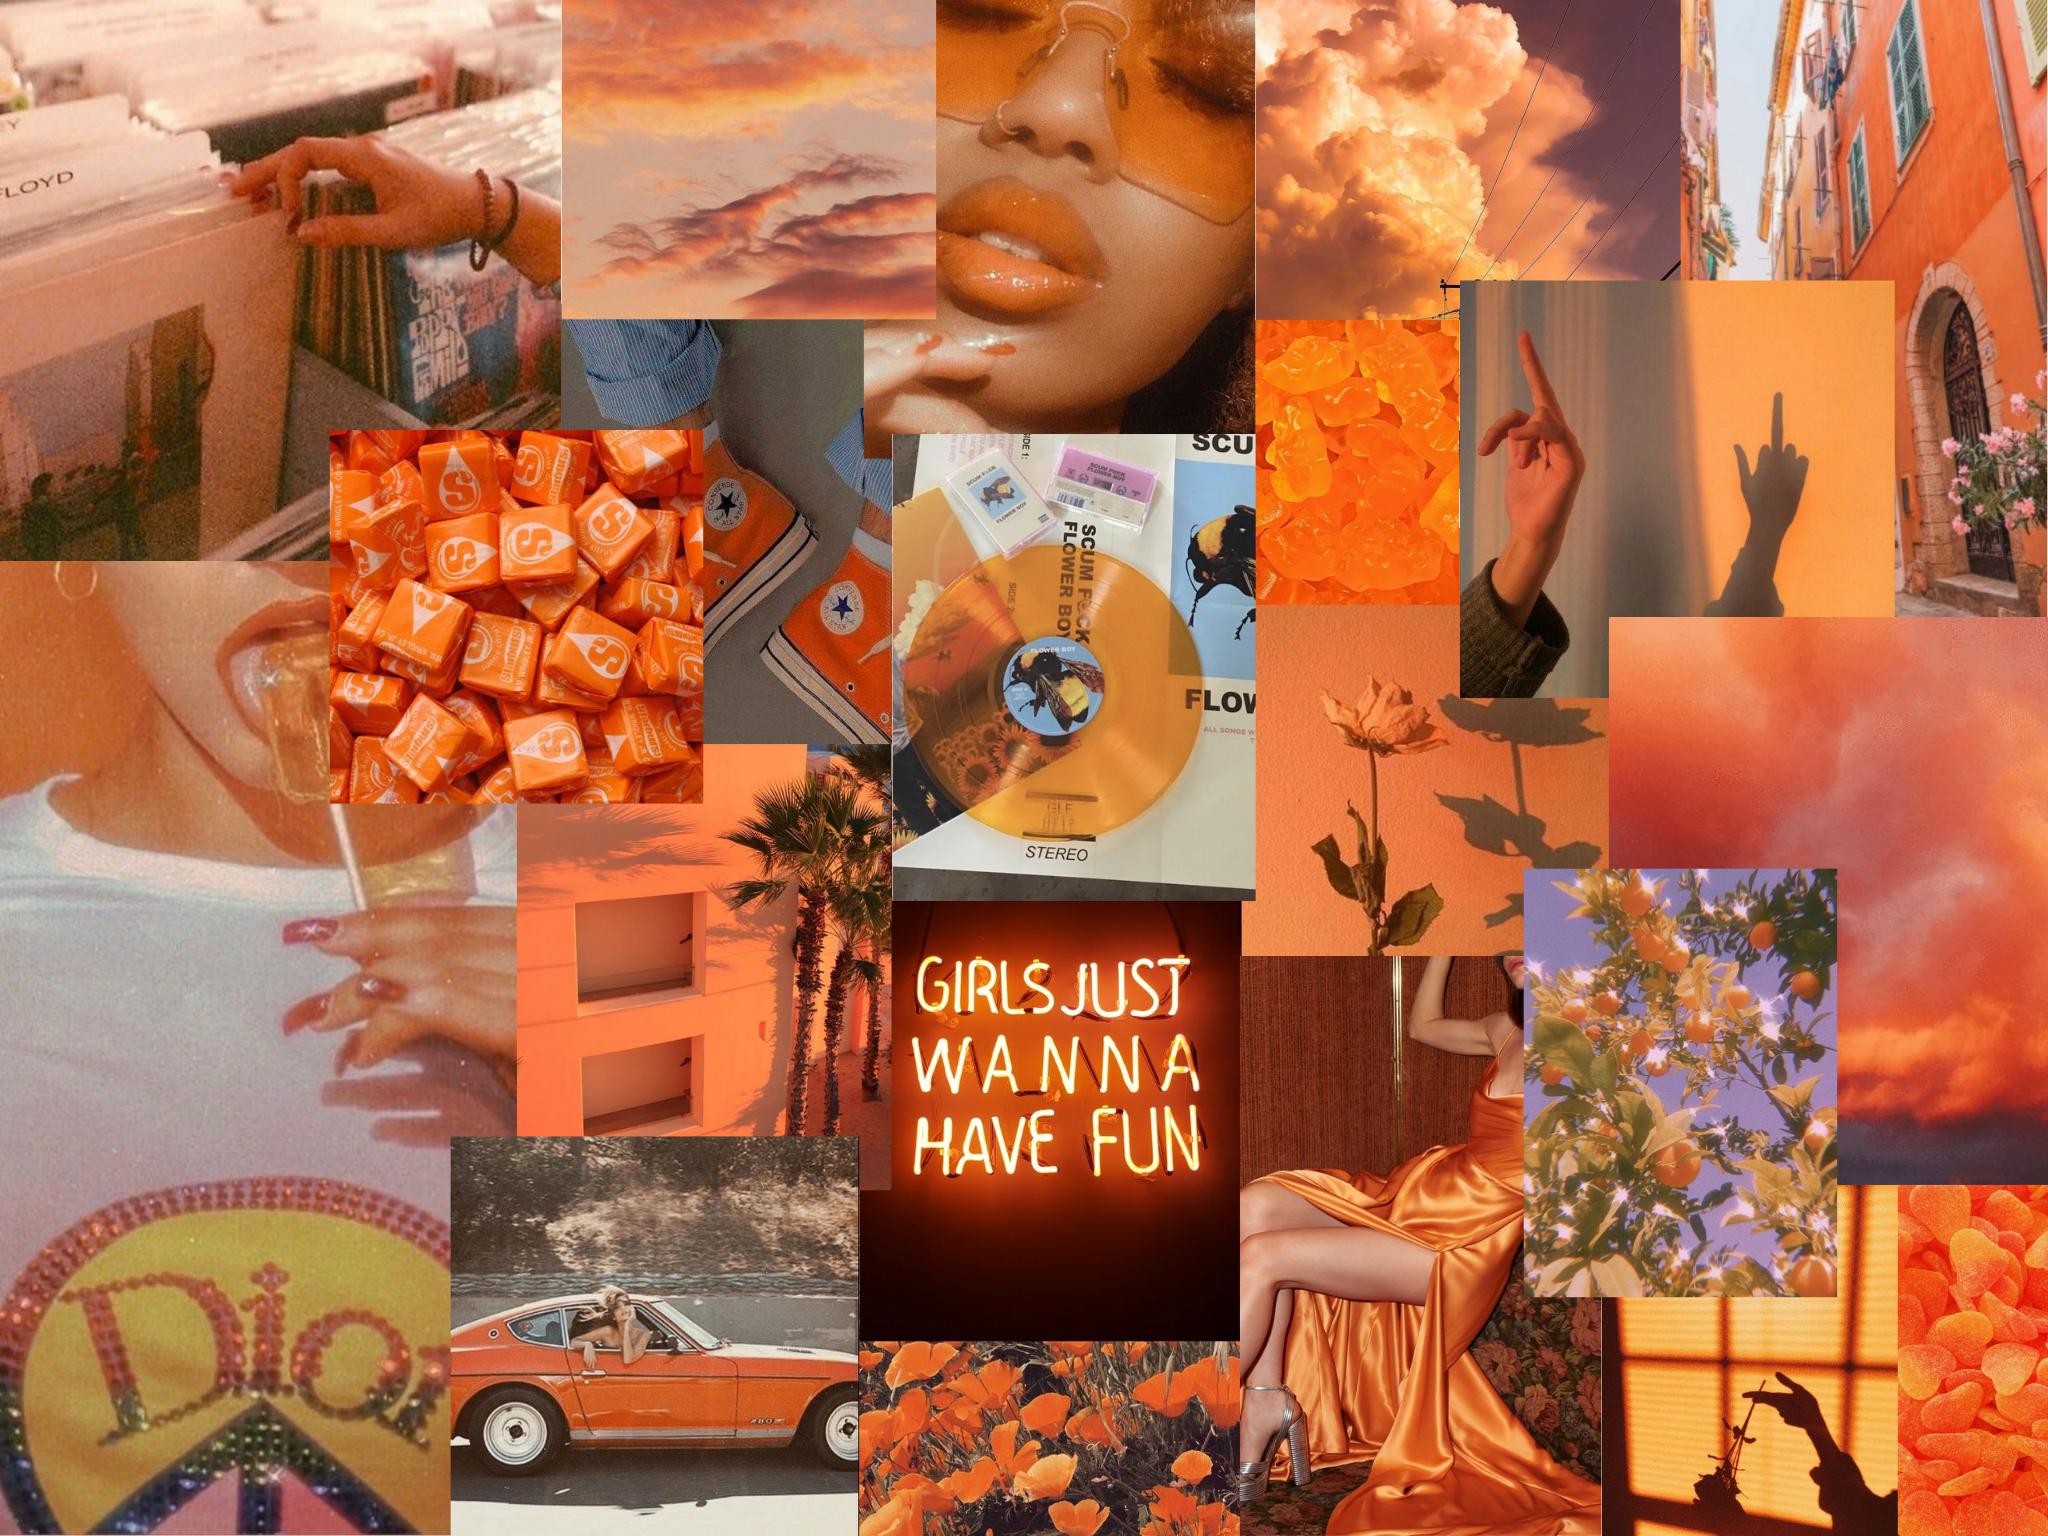 Aesthetic Ipad Wallpaper Orange Orange Aesthetic Wallpaper Ipad Wallpaper